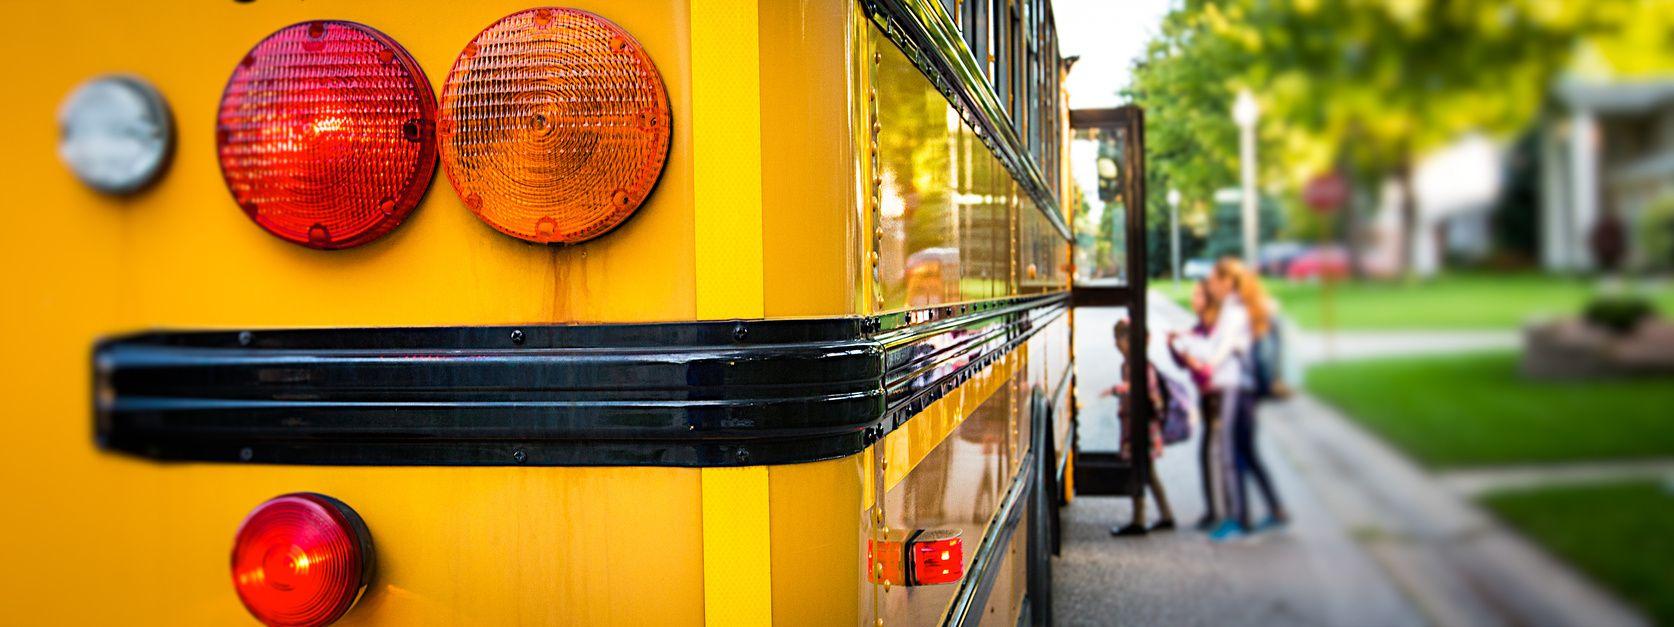 List of Outstanding Preschools In Howard County Maryland